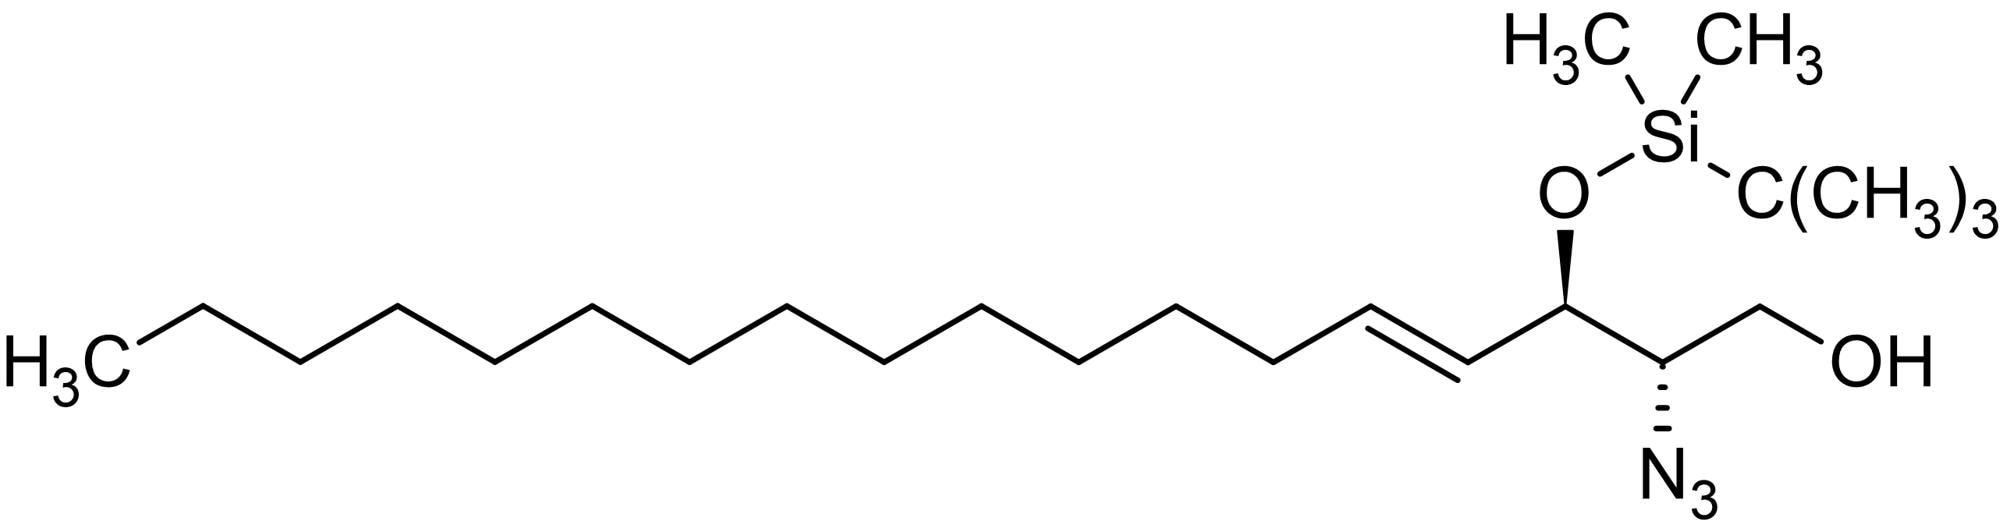 Chemical Structure - (2S,3R,4E)-2-Azido-3-(tert-butyldimethylsilyl)-erythro-sphingosine, Protein kinase C inhibitor (ab144921)